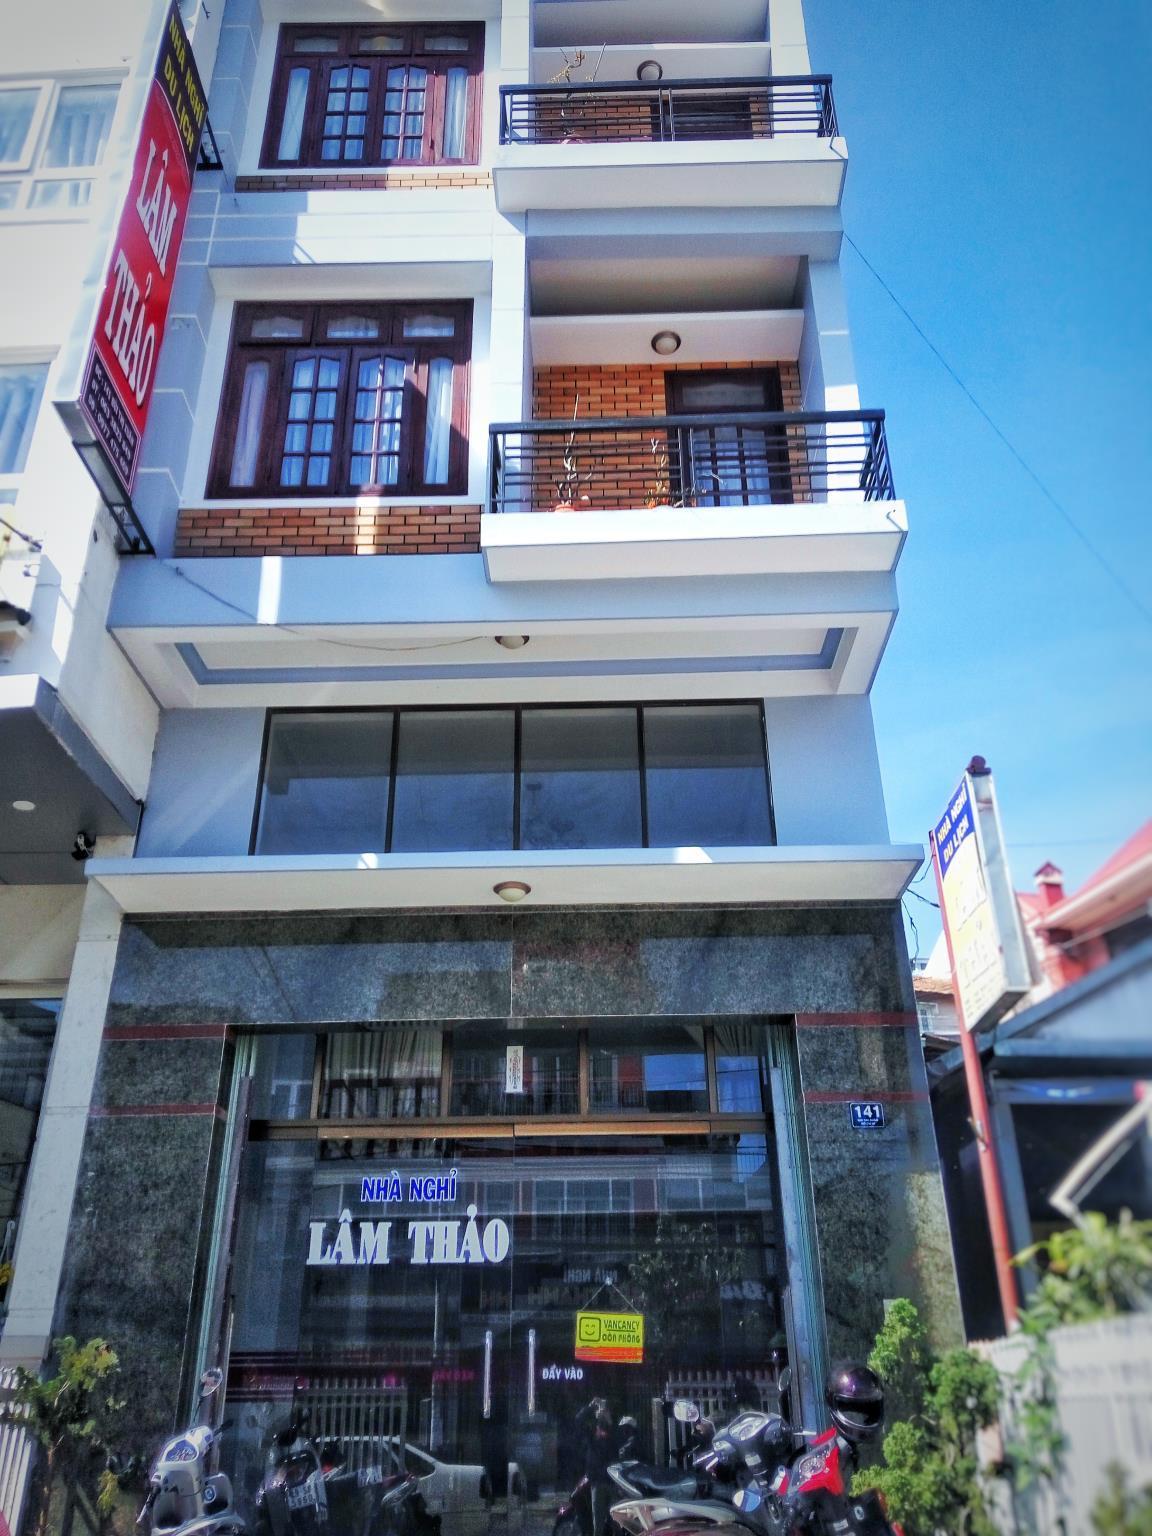 Lam Thao Hostel